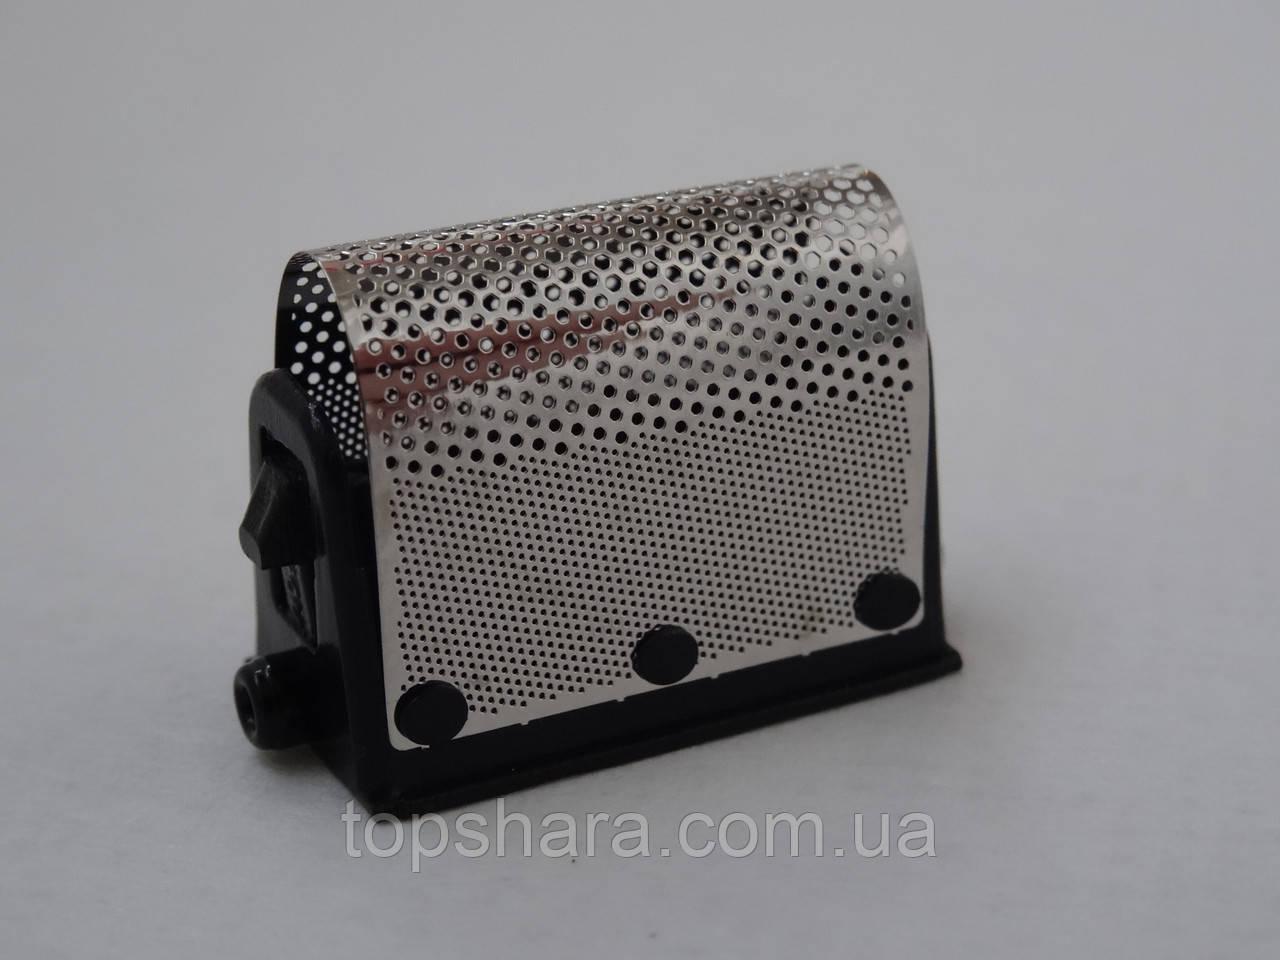 Сетка для бритья триммера Philips MG7770/15